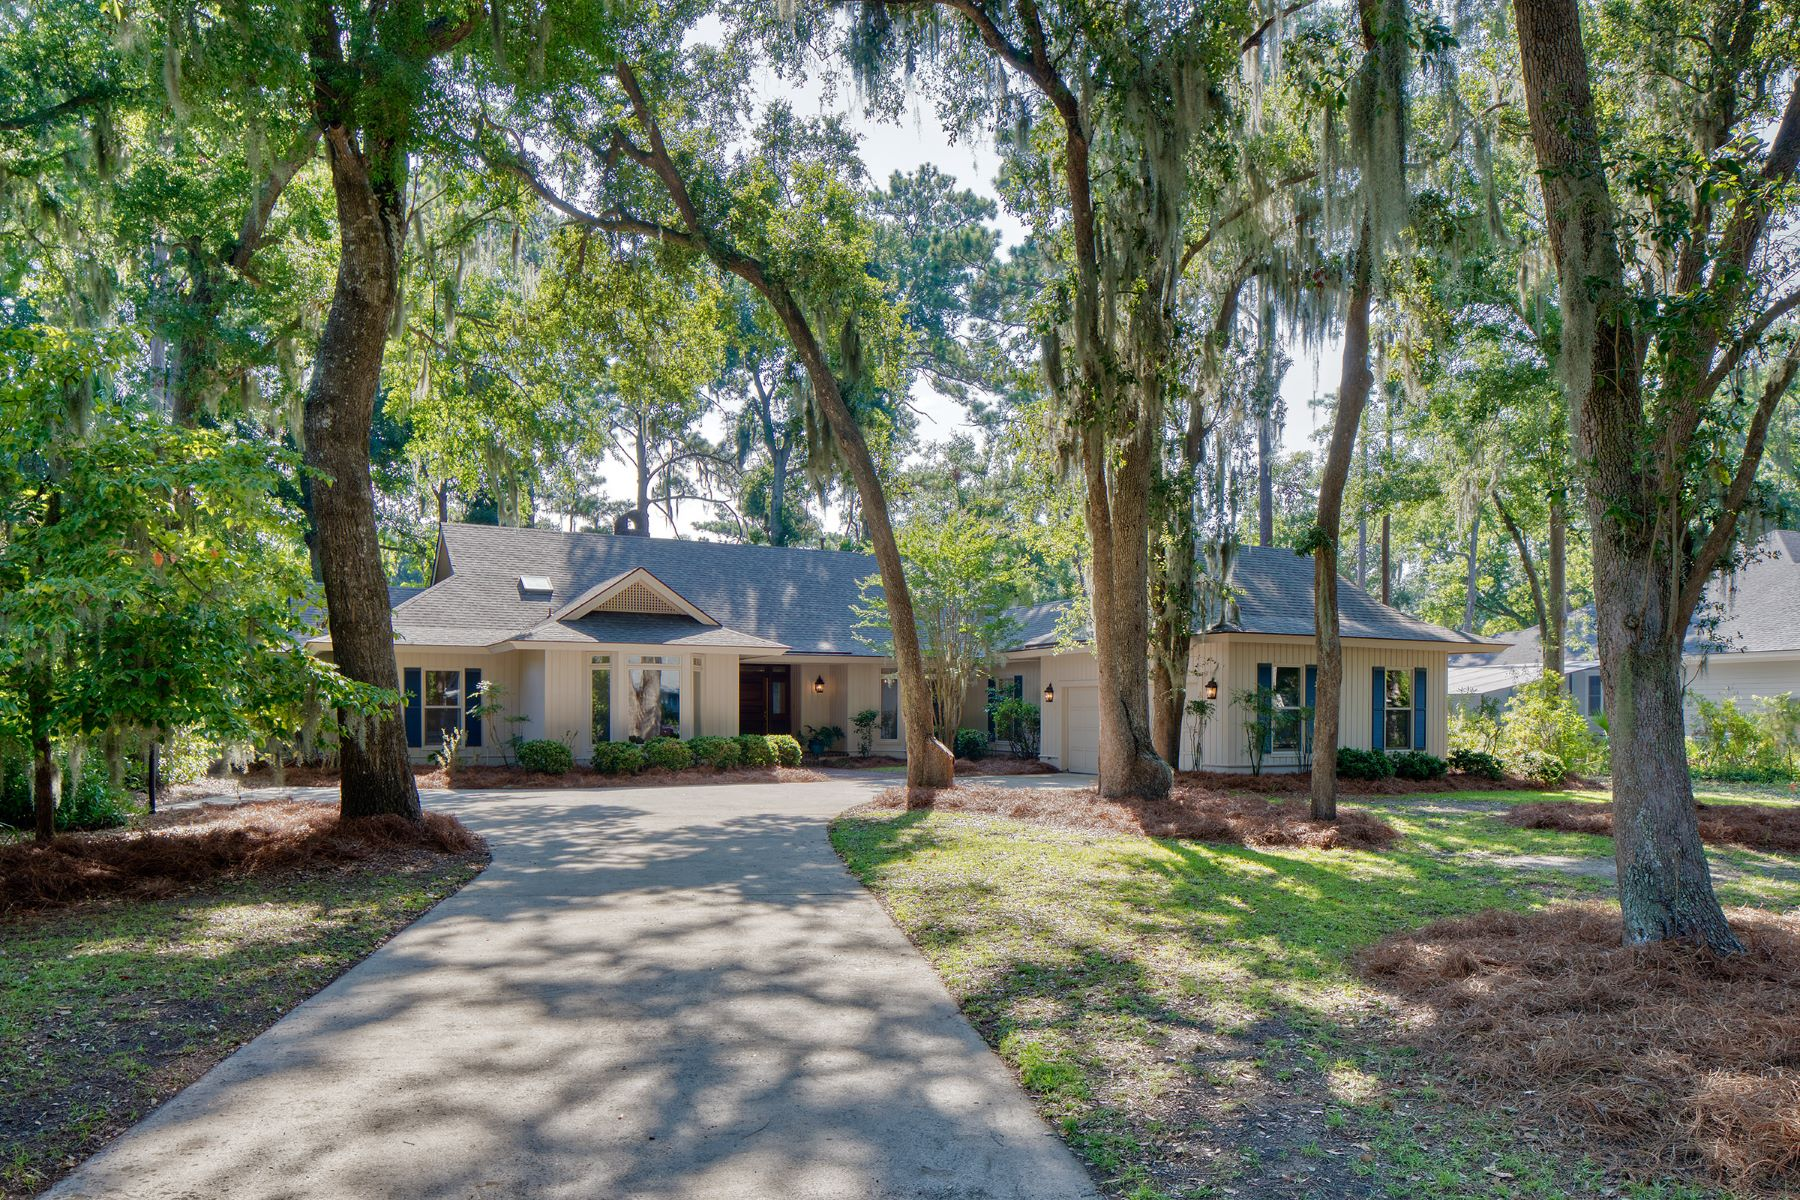 Single Family Homes for Sale at 13 Sweetgum Crossing Skidaway Island, Georgia 31411 United States